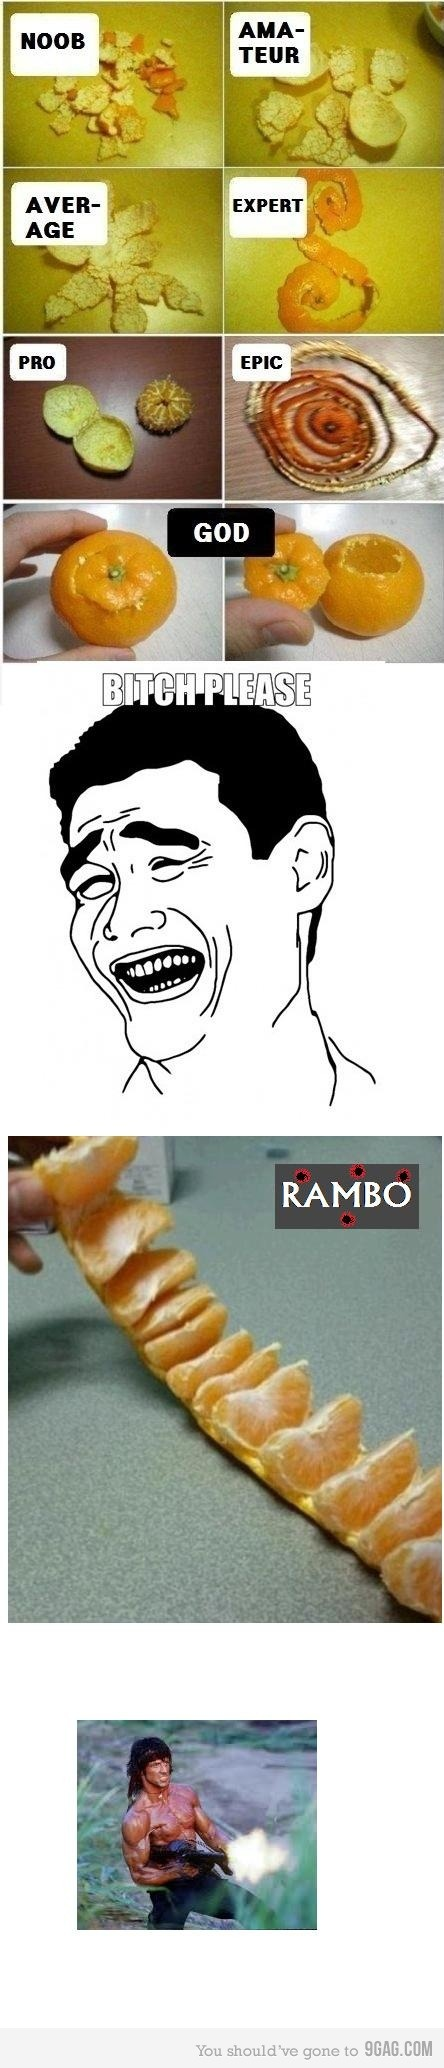 Ha. Orange peeling like a Rambo.